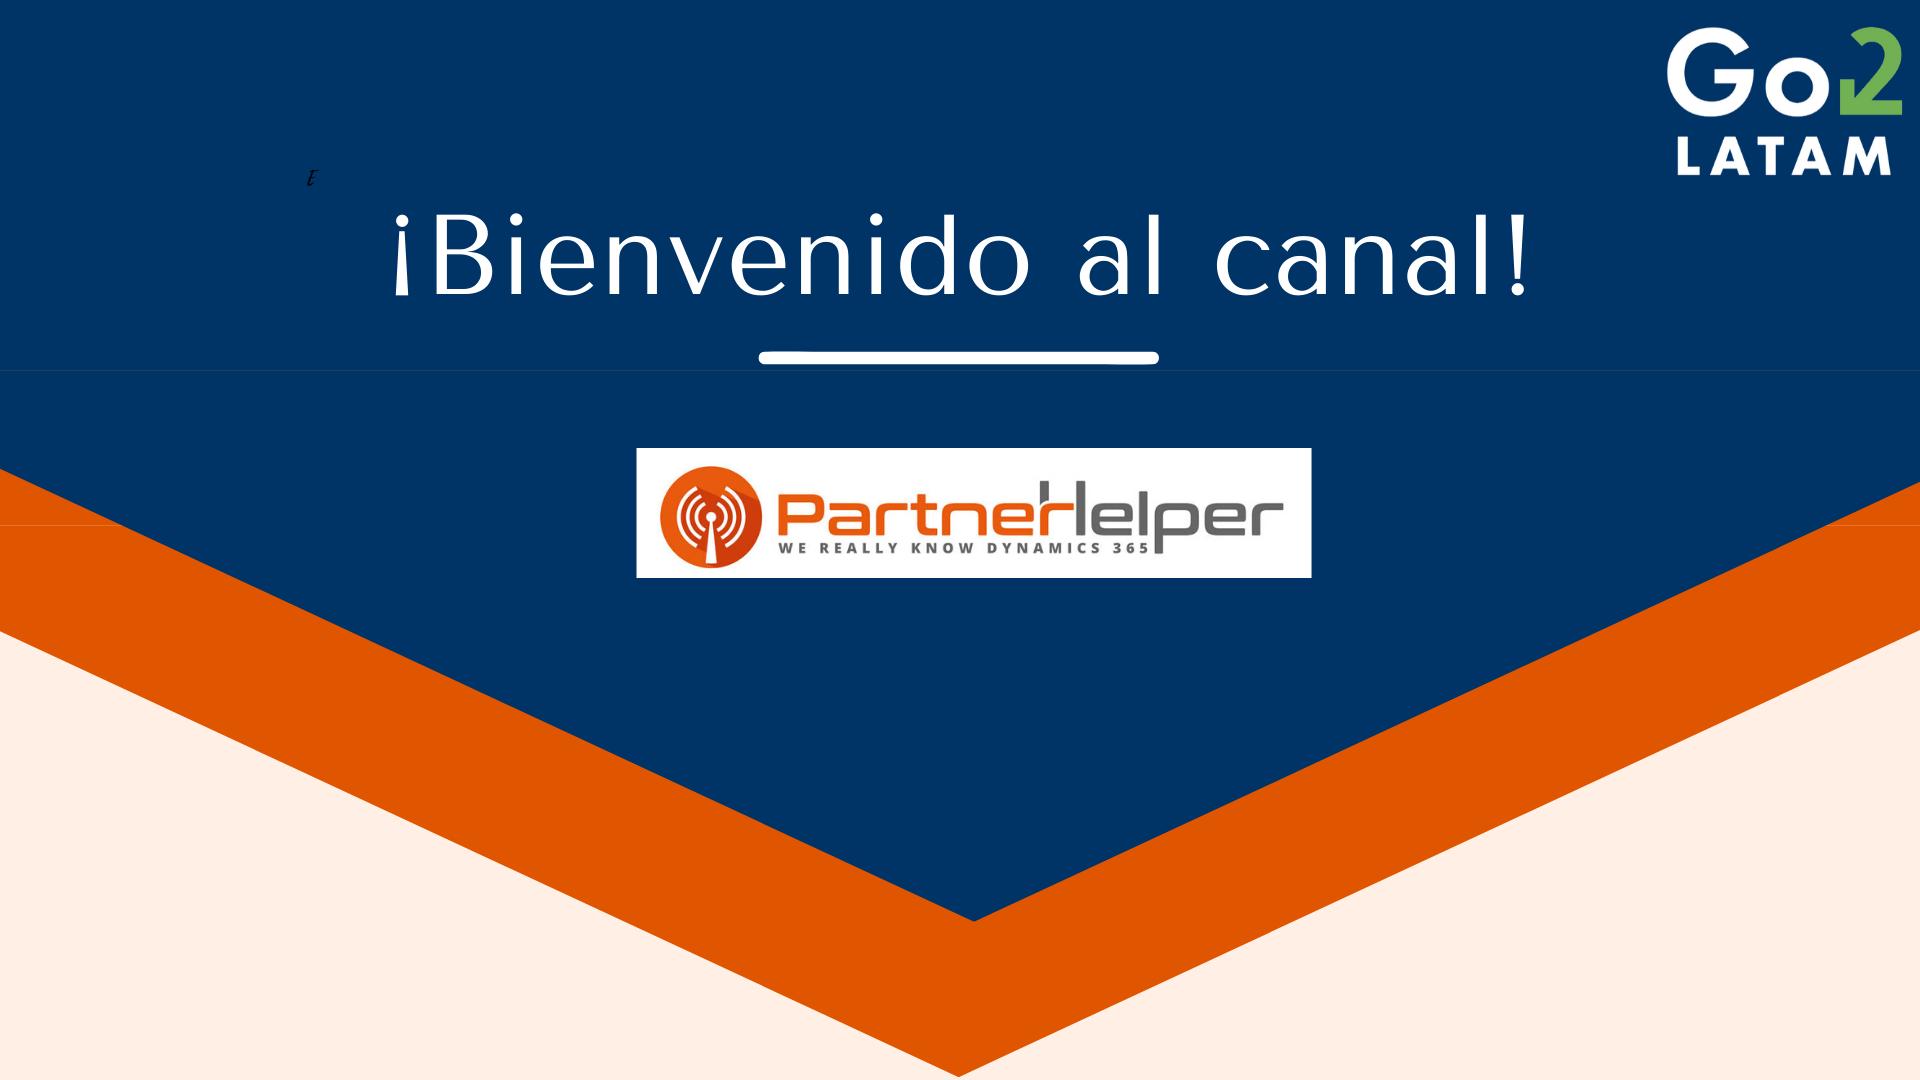 PartnerHelper nuevo partner de Go2Latam